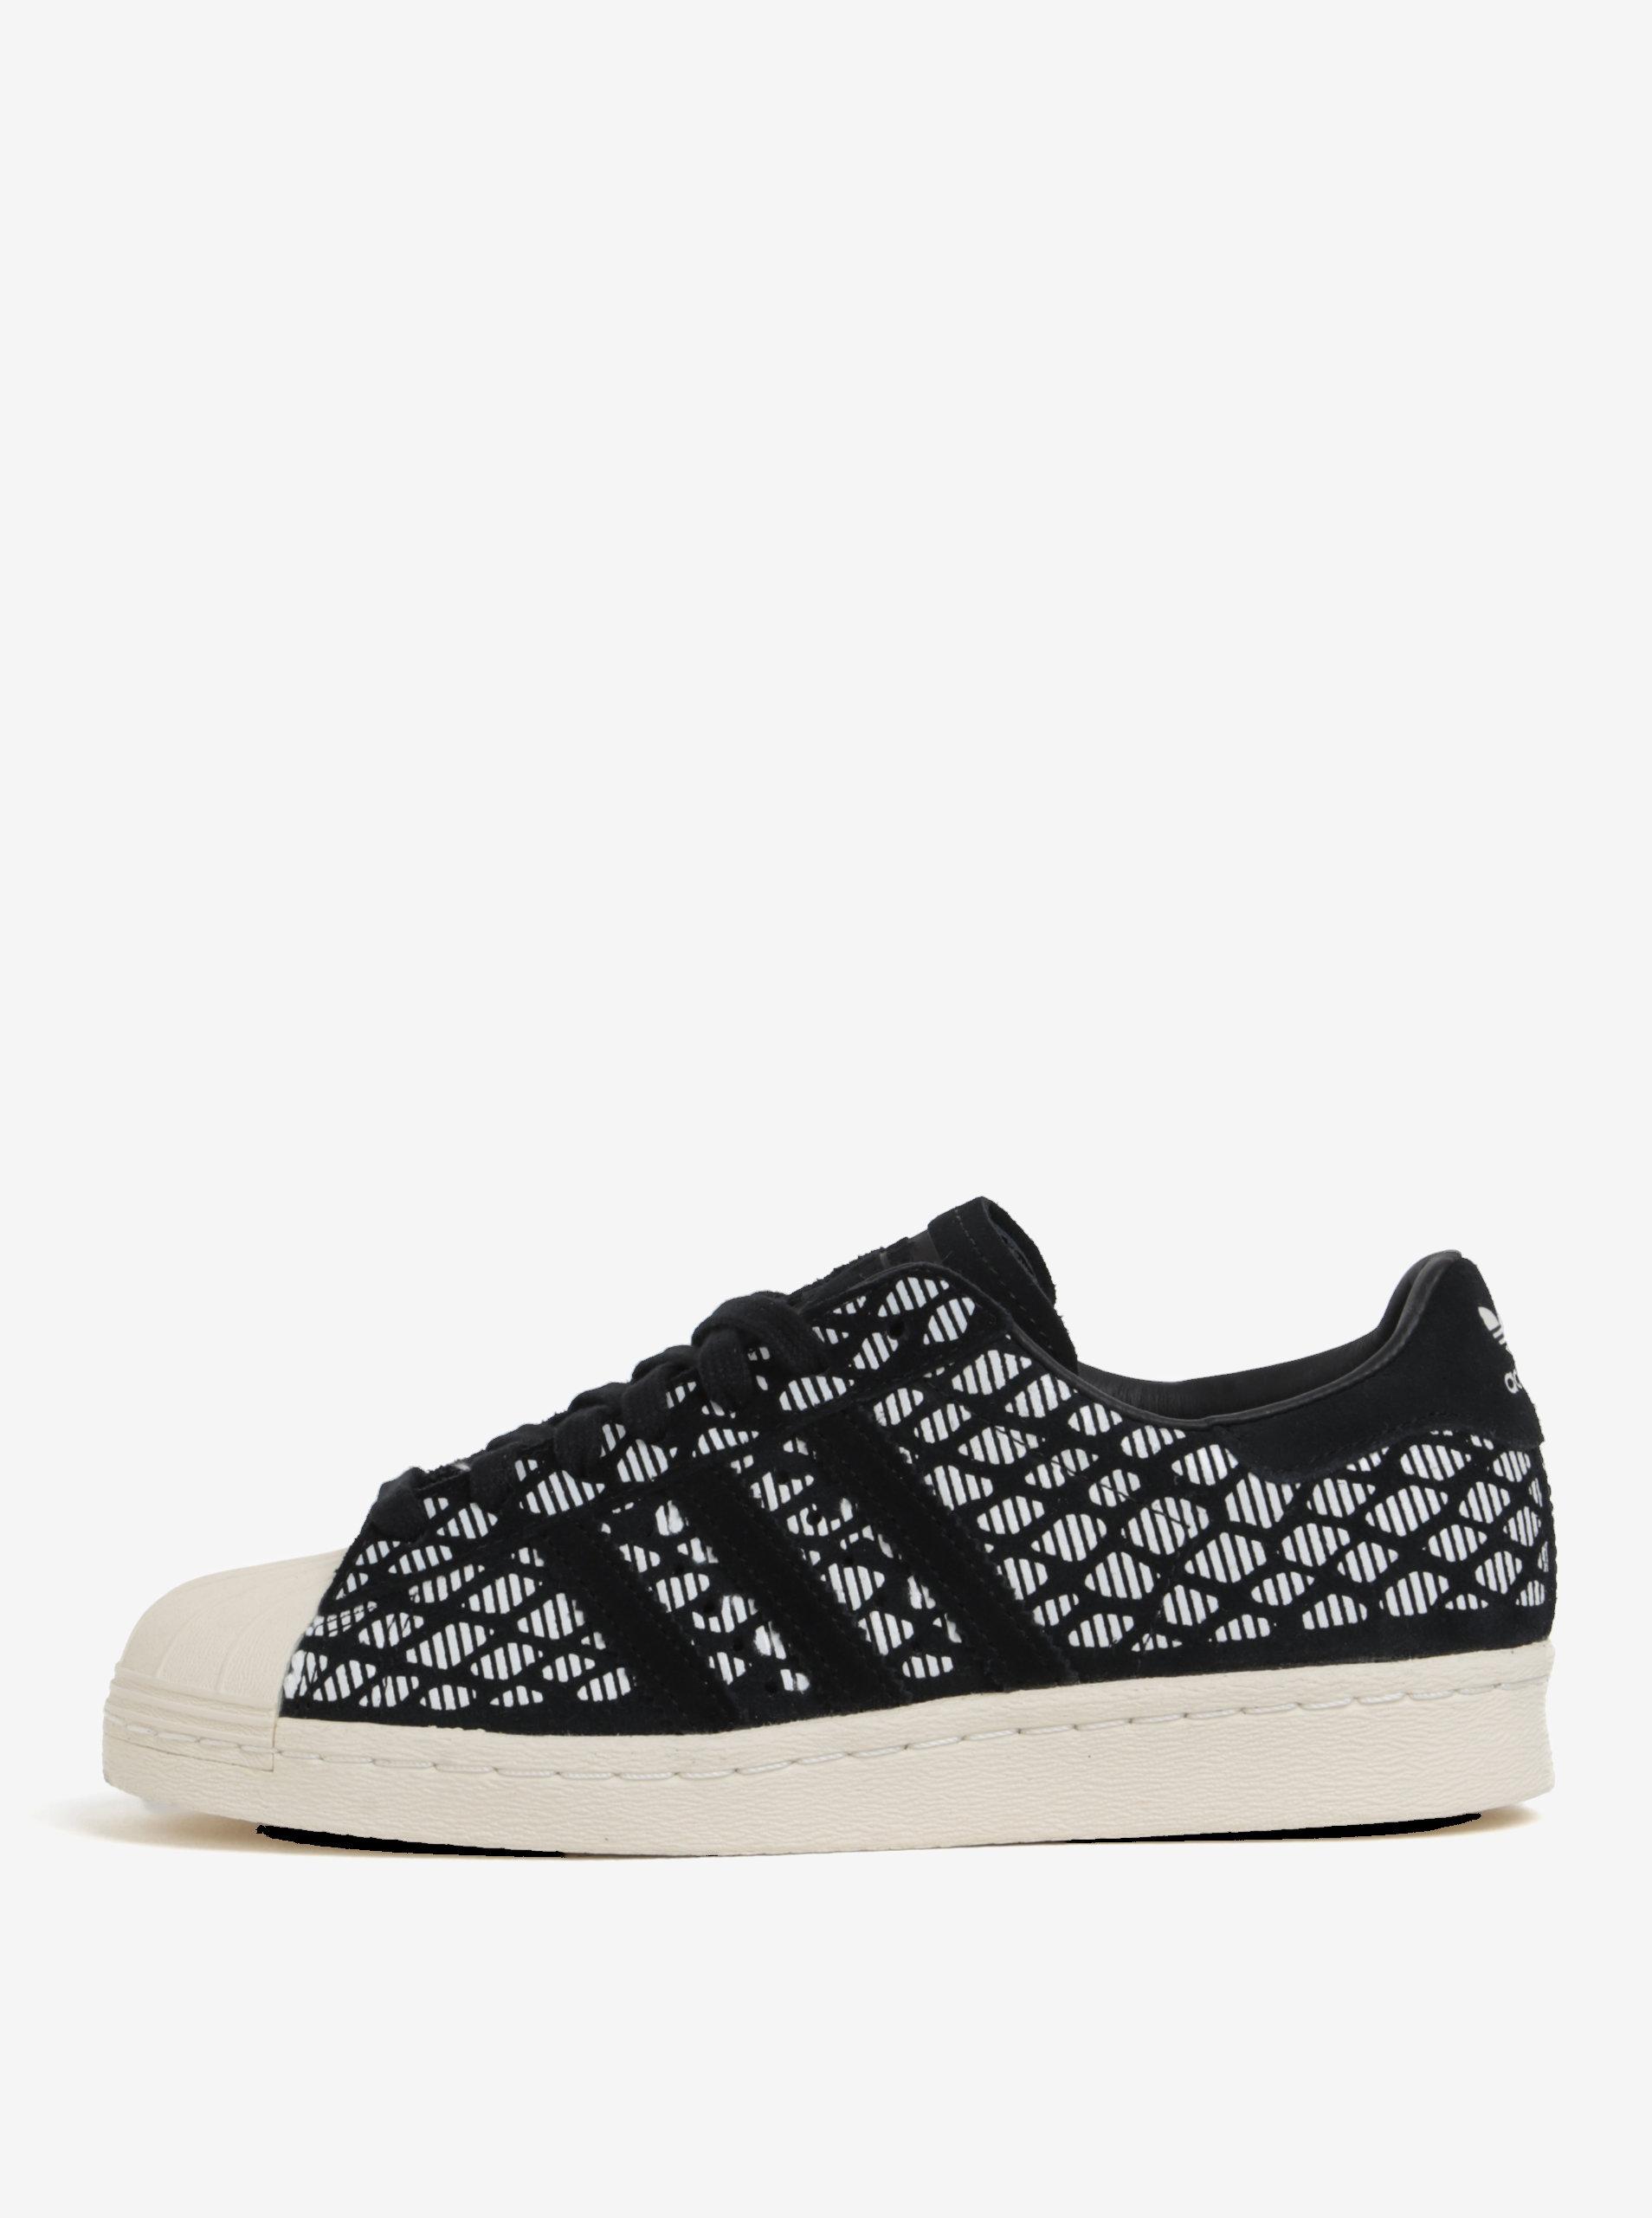 Bílo-černé dámské semišové tenisky adidas Originals Superstar ... 3135984cb24